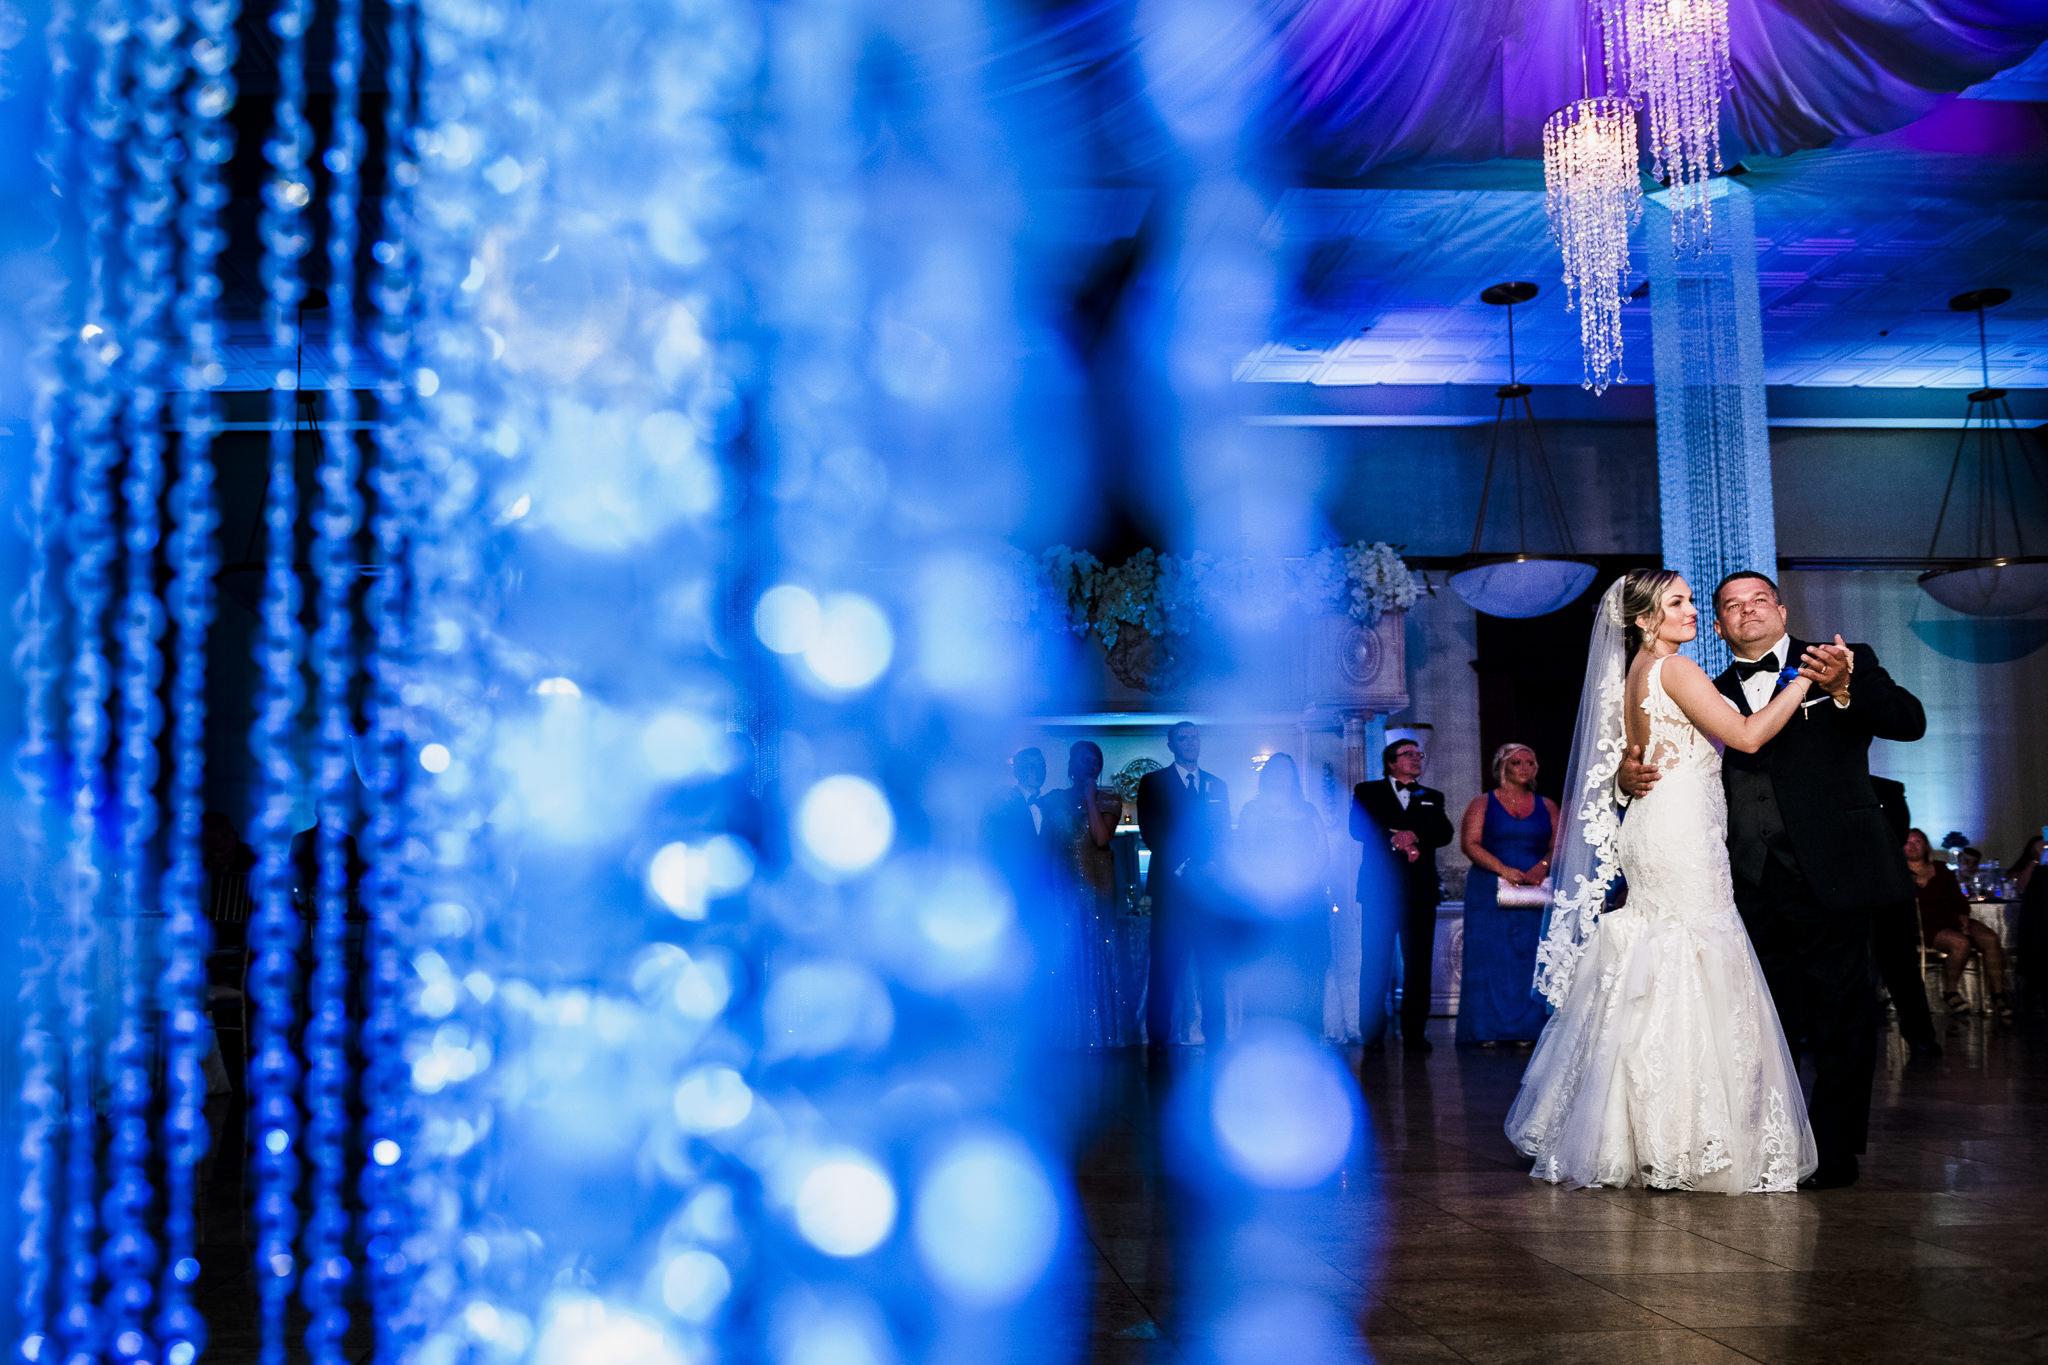 Brennan-South-Gate-Manor-New-Jersey-Wedding-Photographer-29.JPG